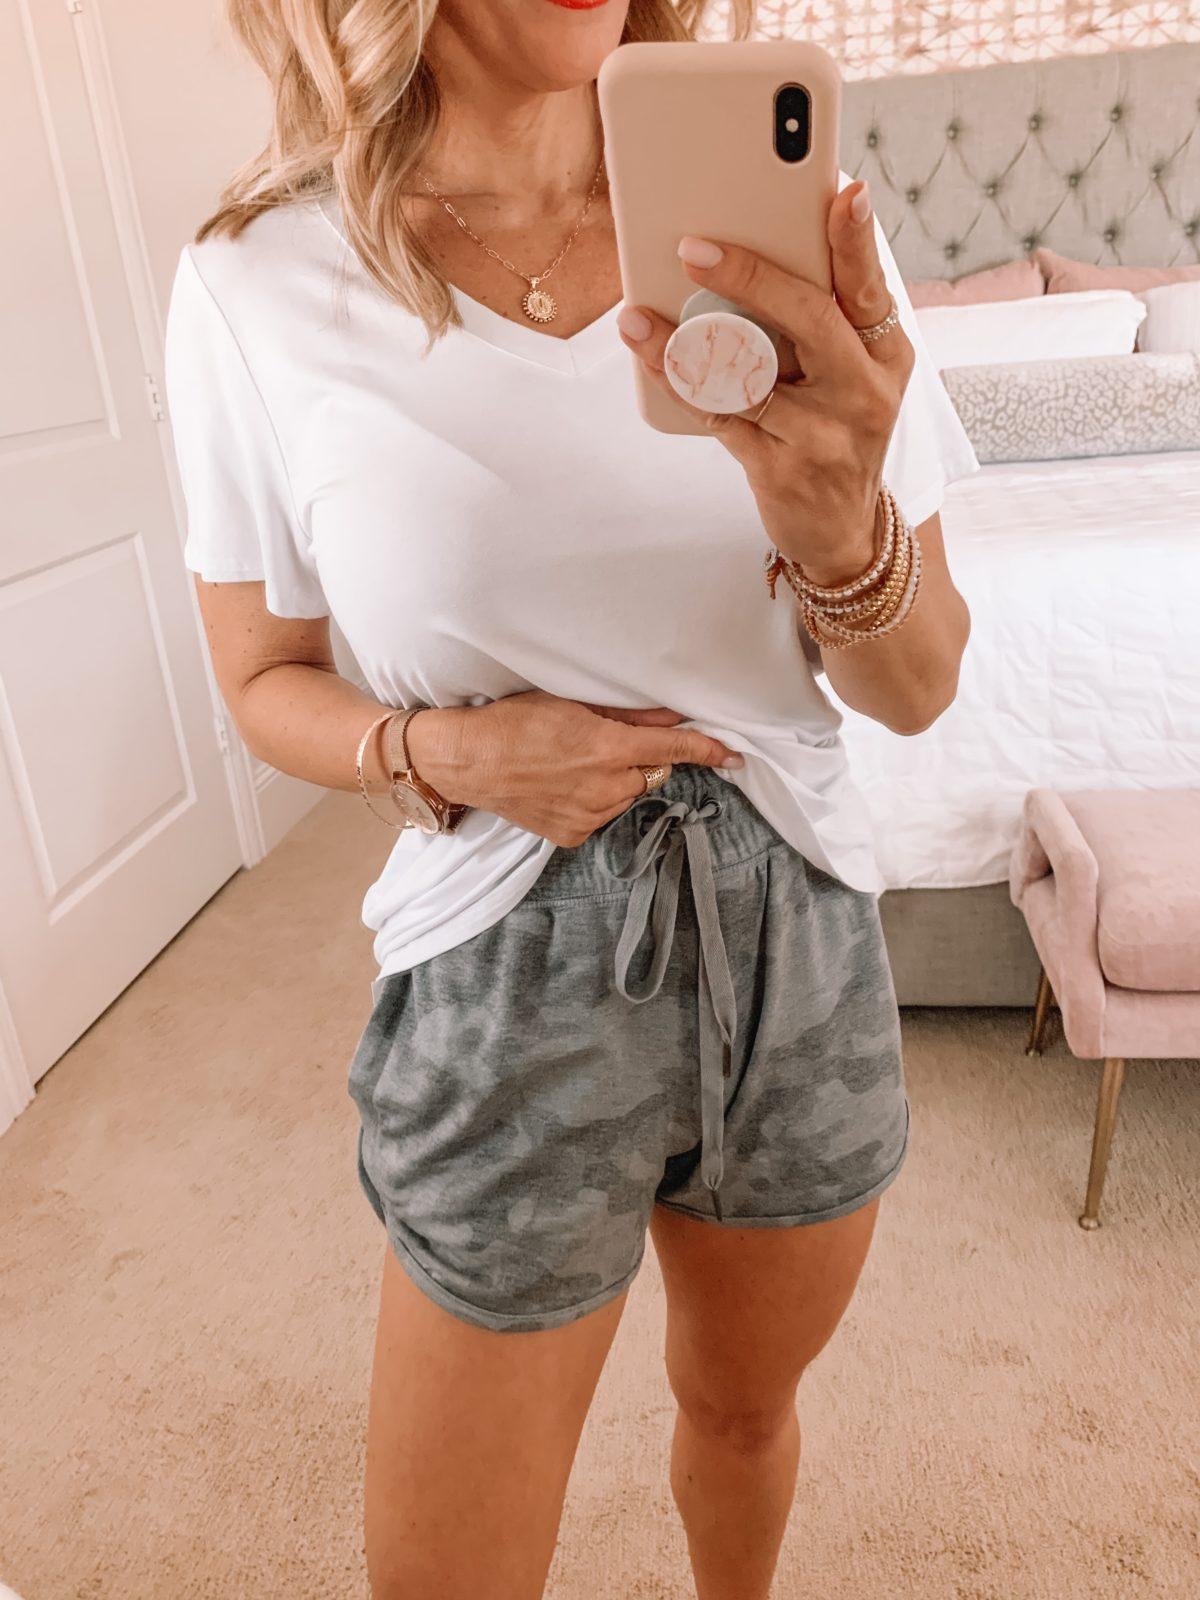 Amazon Fashion Faves, White Tee and Camo Shorts